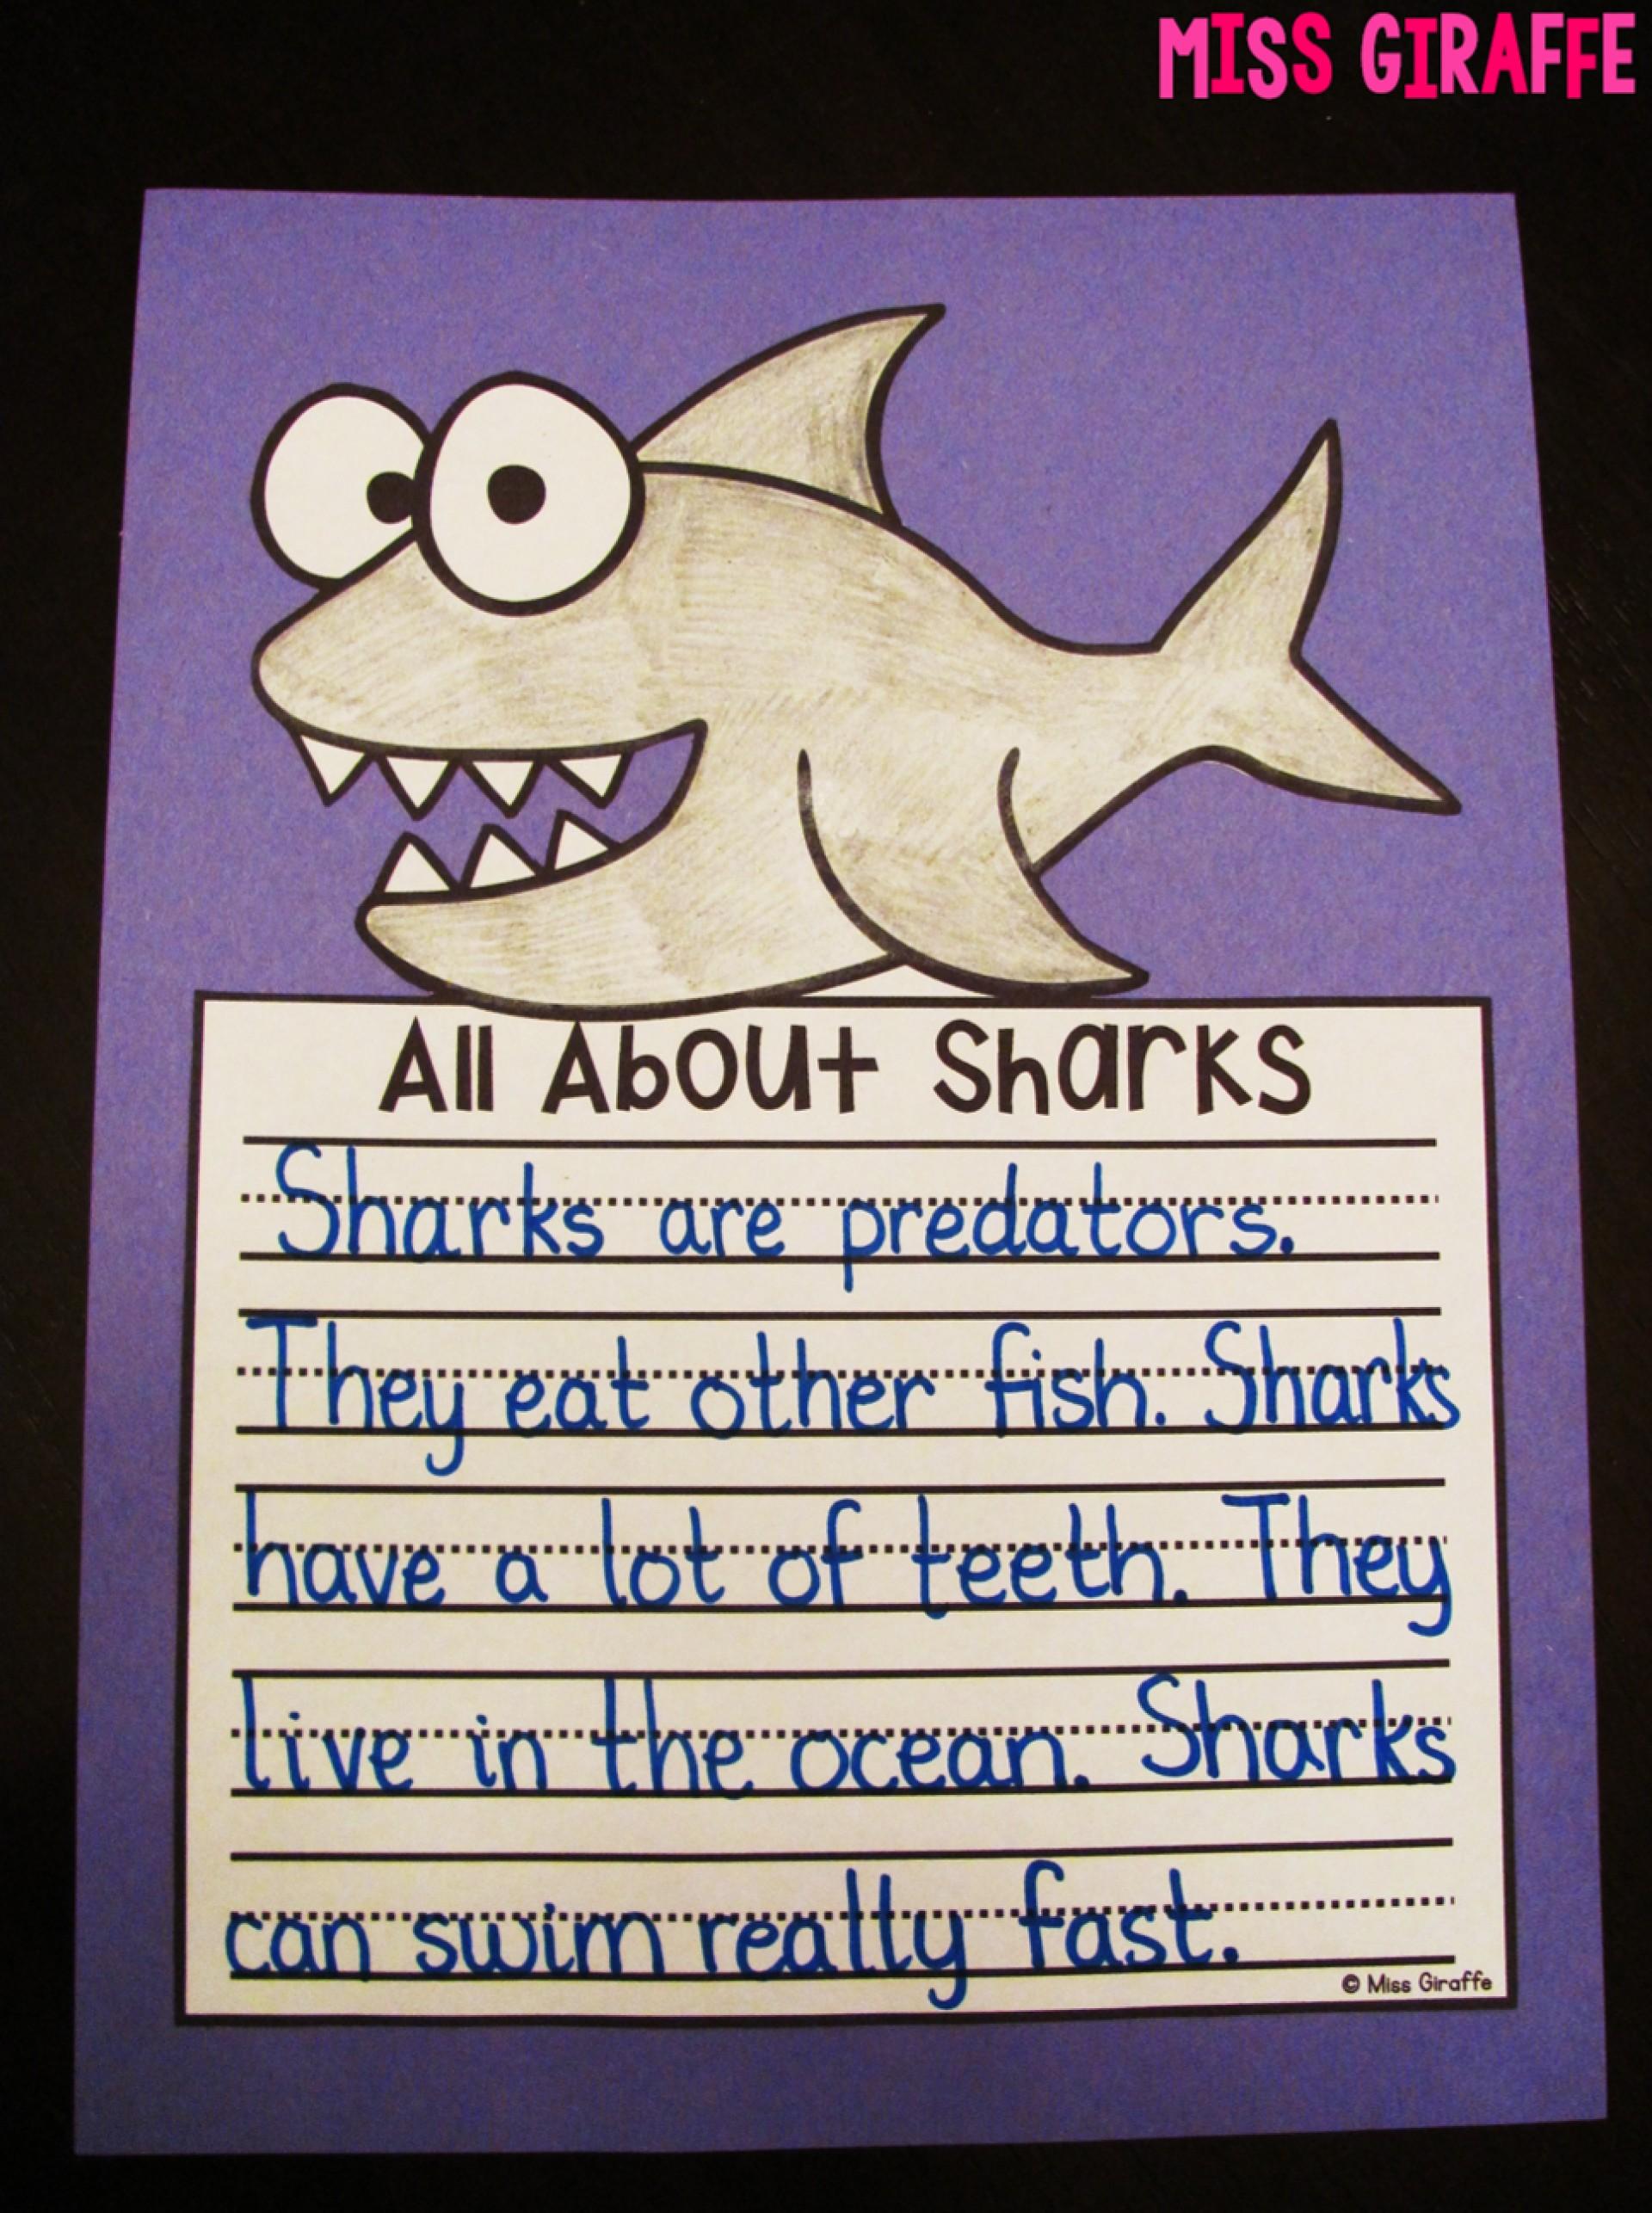 018 Essay Example Shark Wonderful Essayshark Sign Up Topics Questions 1920